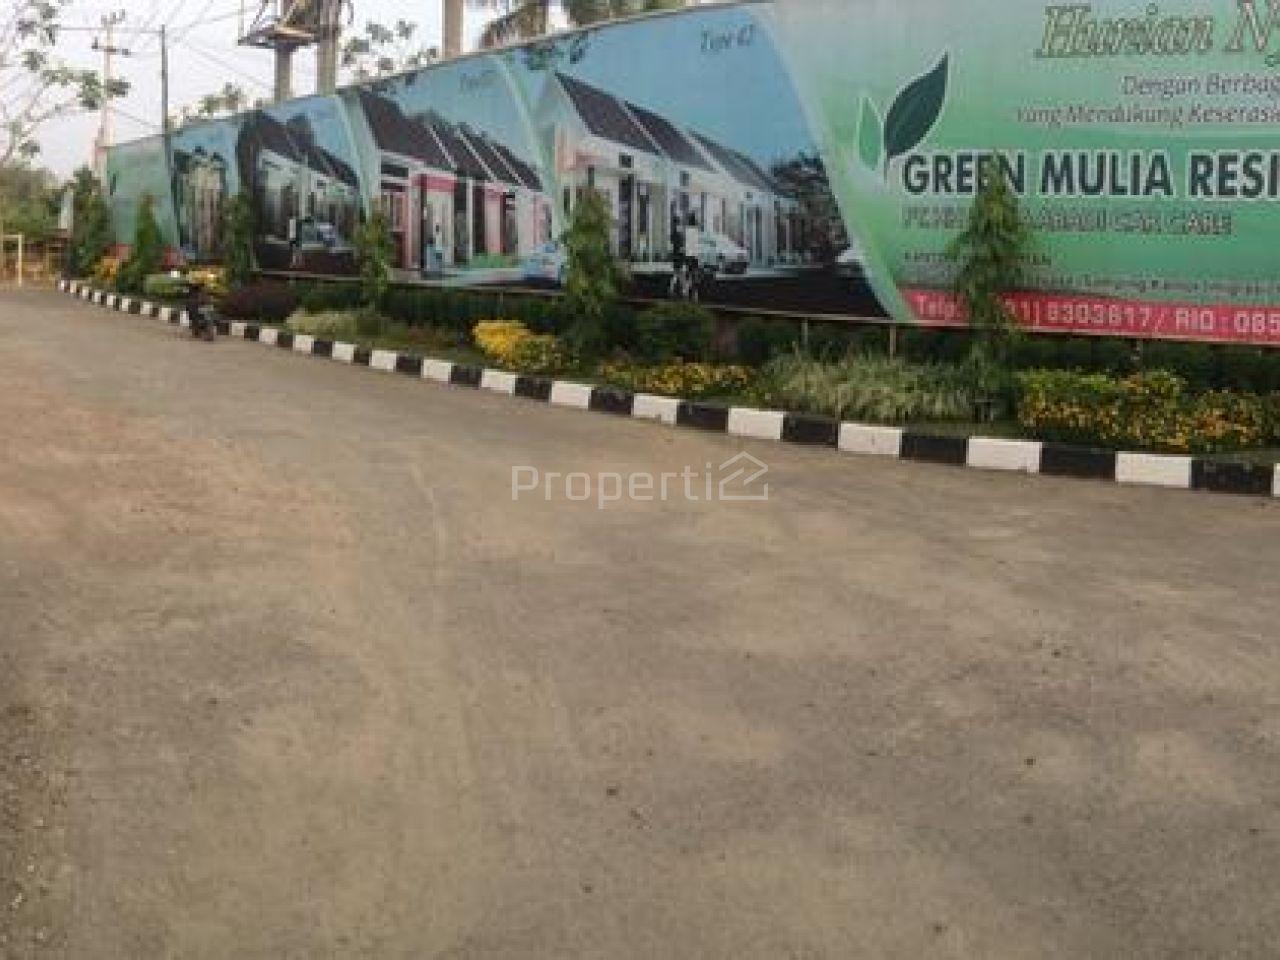 Take Over Perumahan Green Mulia Residence di Cirebon, Jawa Barat